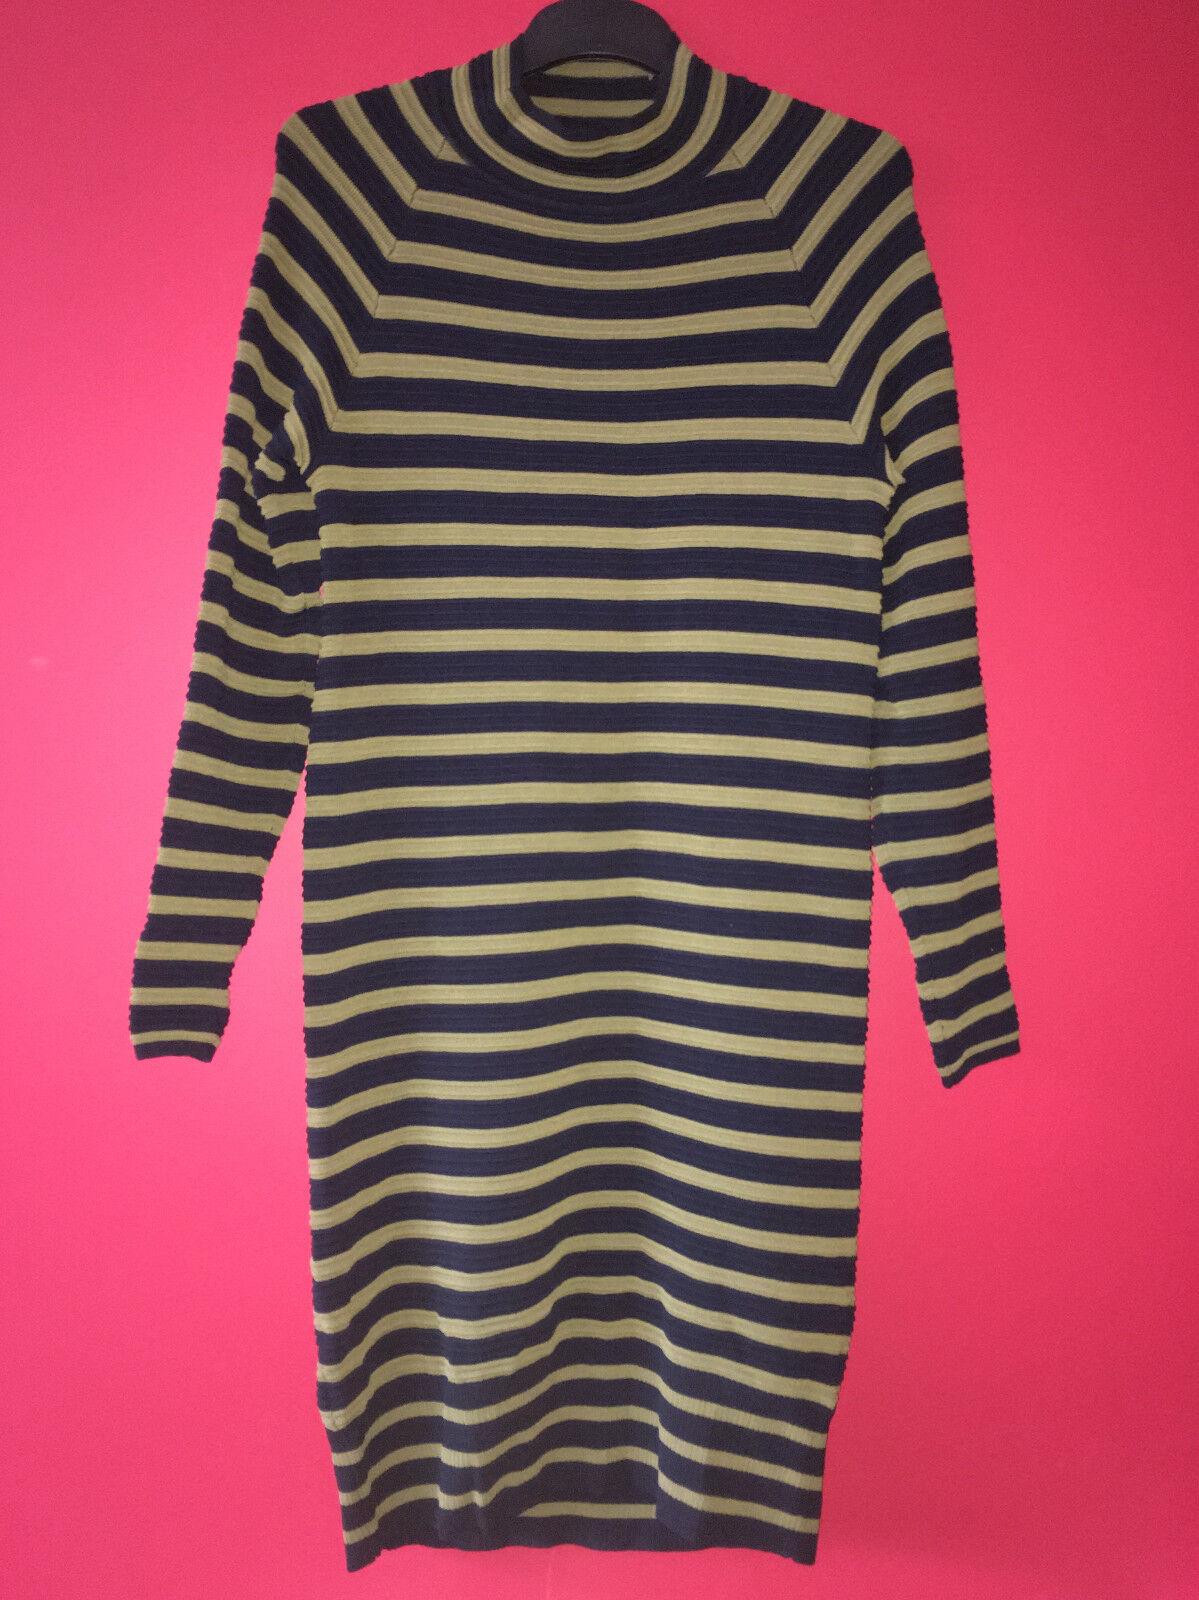 Next Nautical Stripe Knitted Stretch Long Sleeve Tunic Jumper Dress Size 14 BNWT